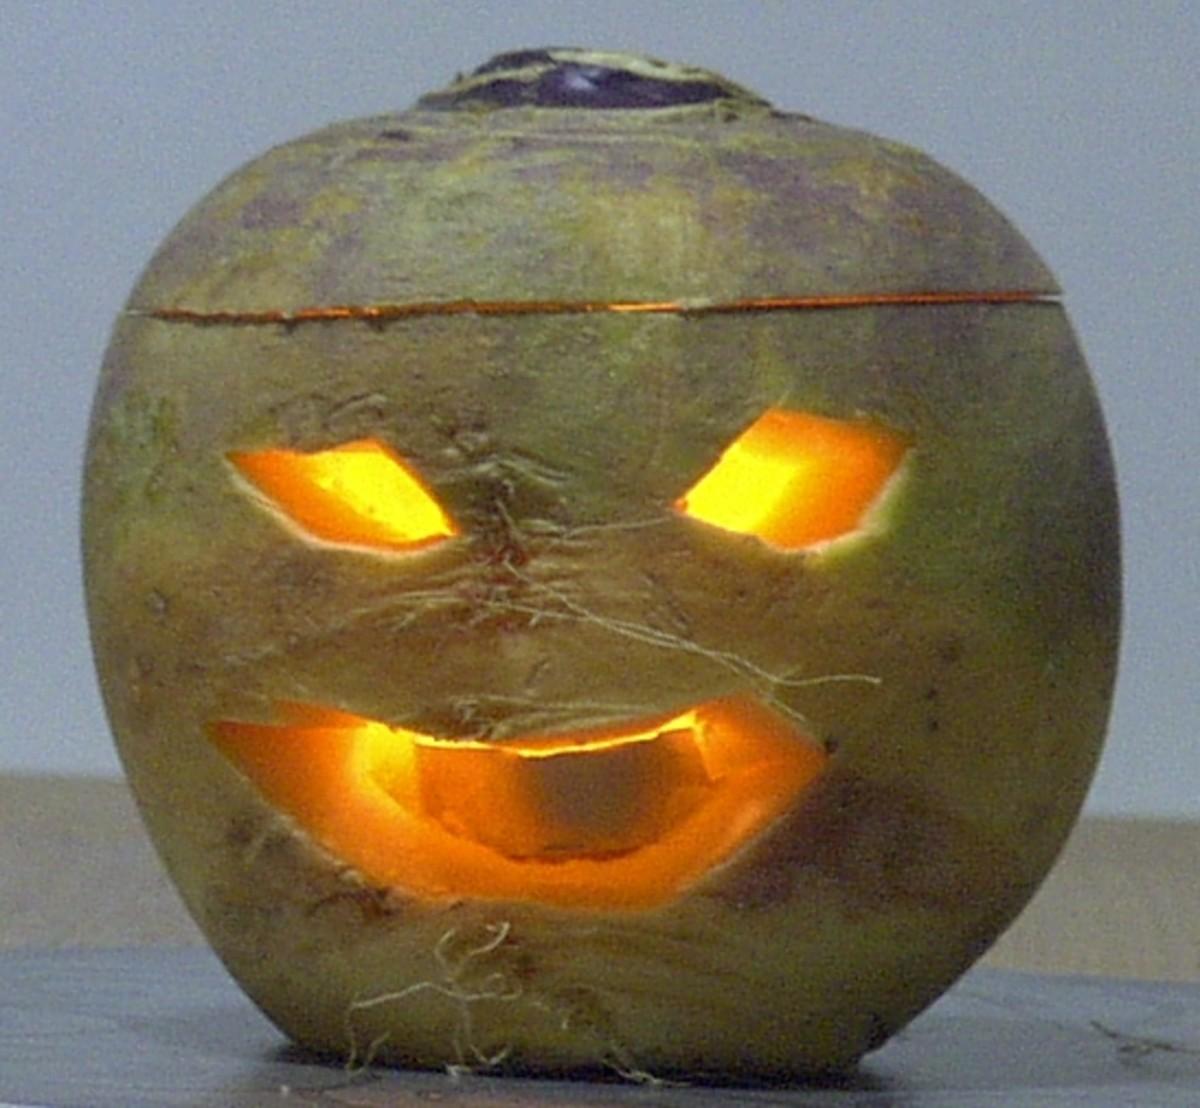 A carved turnip jack-o-lantern